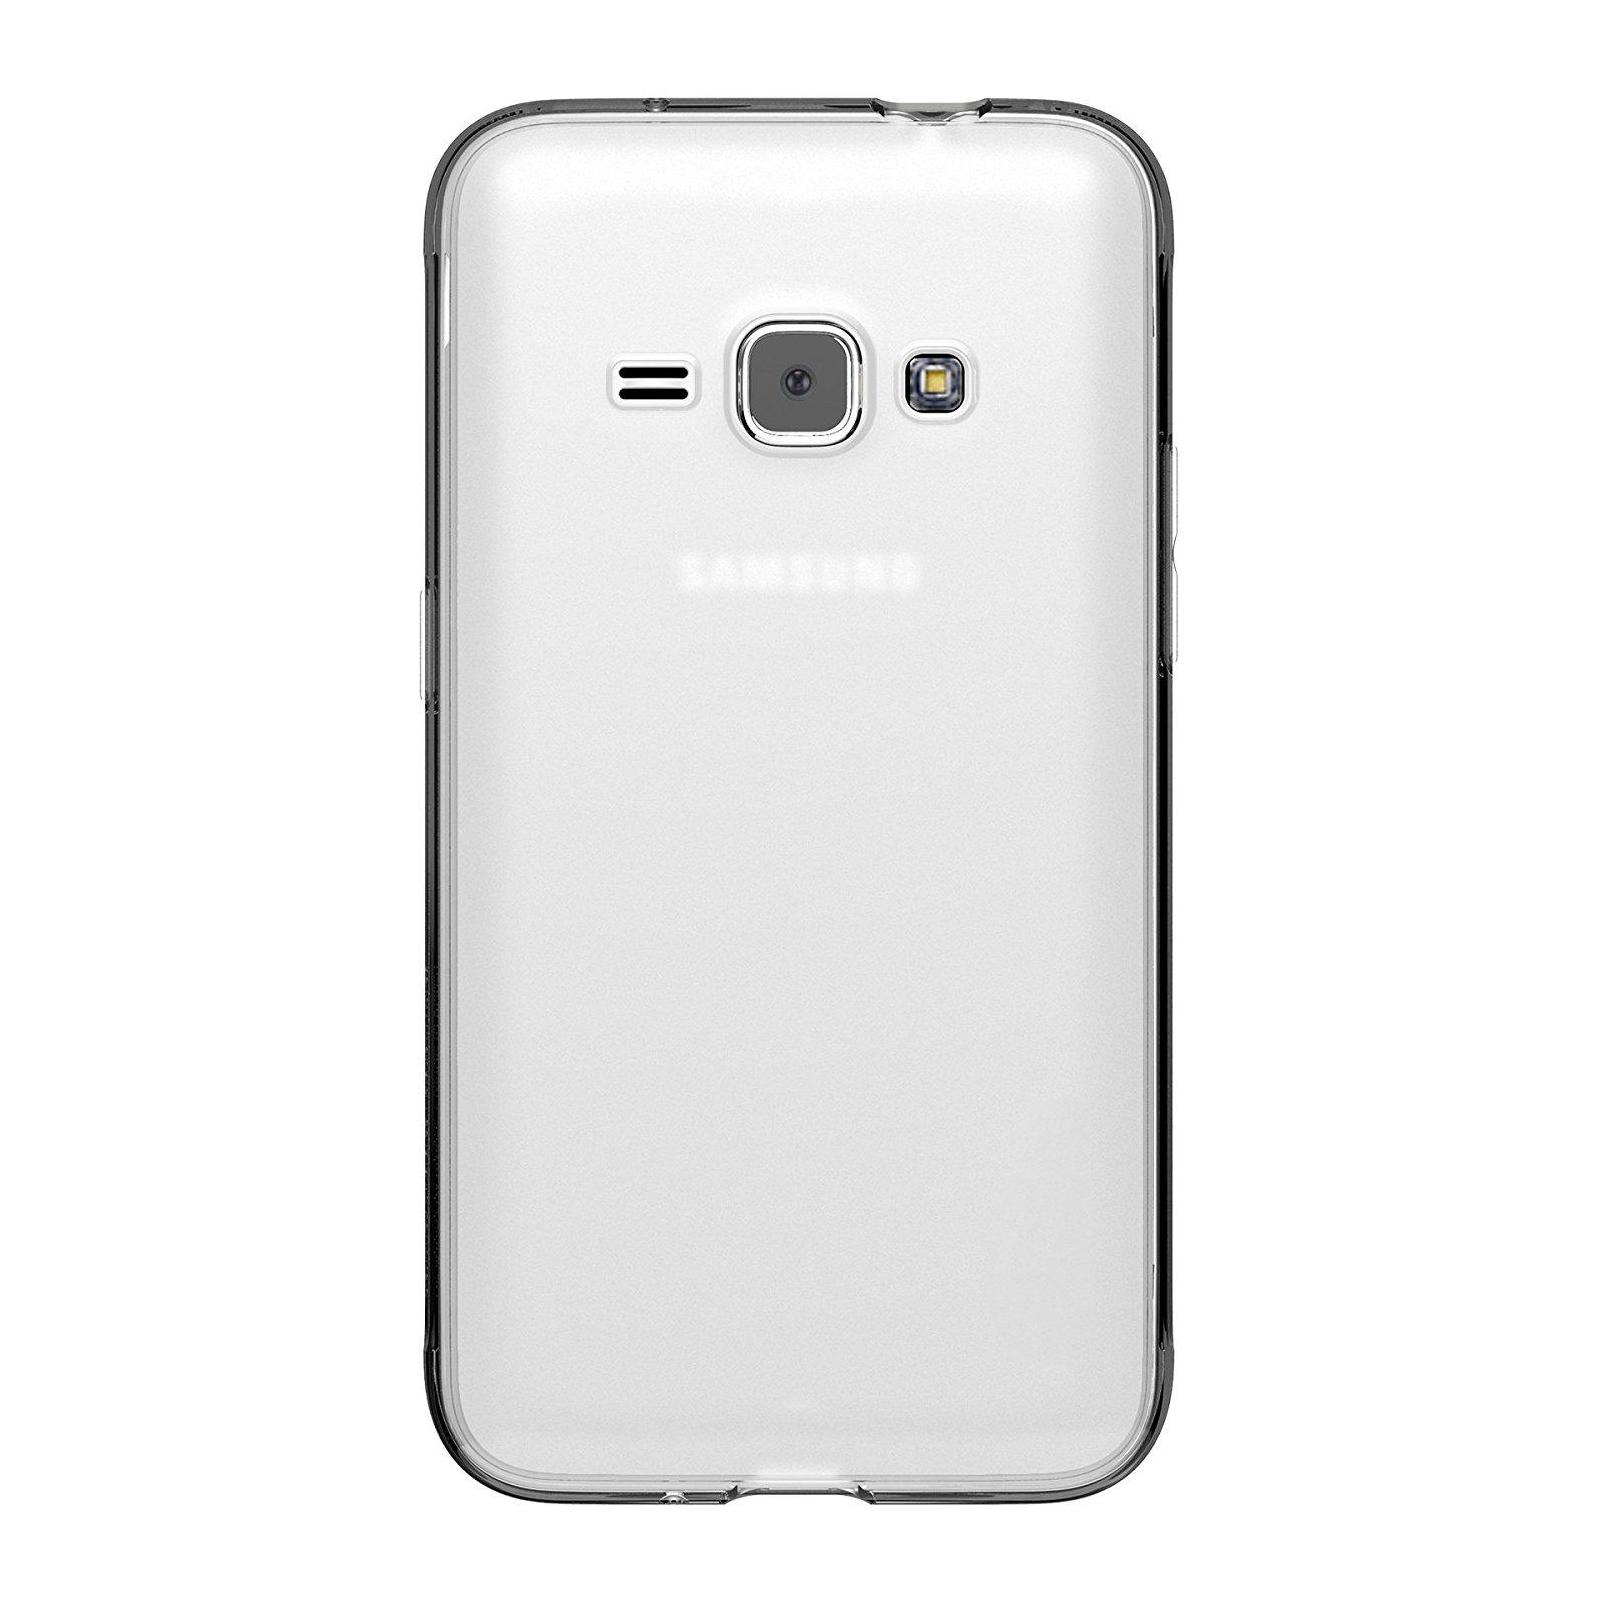 Чехол для моб. телефона SmartCase Samsung Galaxy J3 /J320 TPU Clear (SC-J320) изображение 2